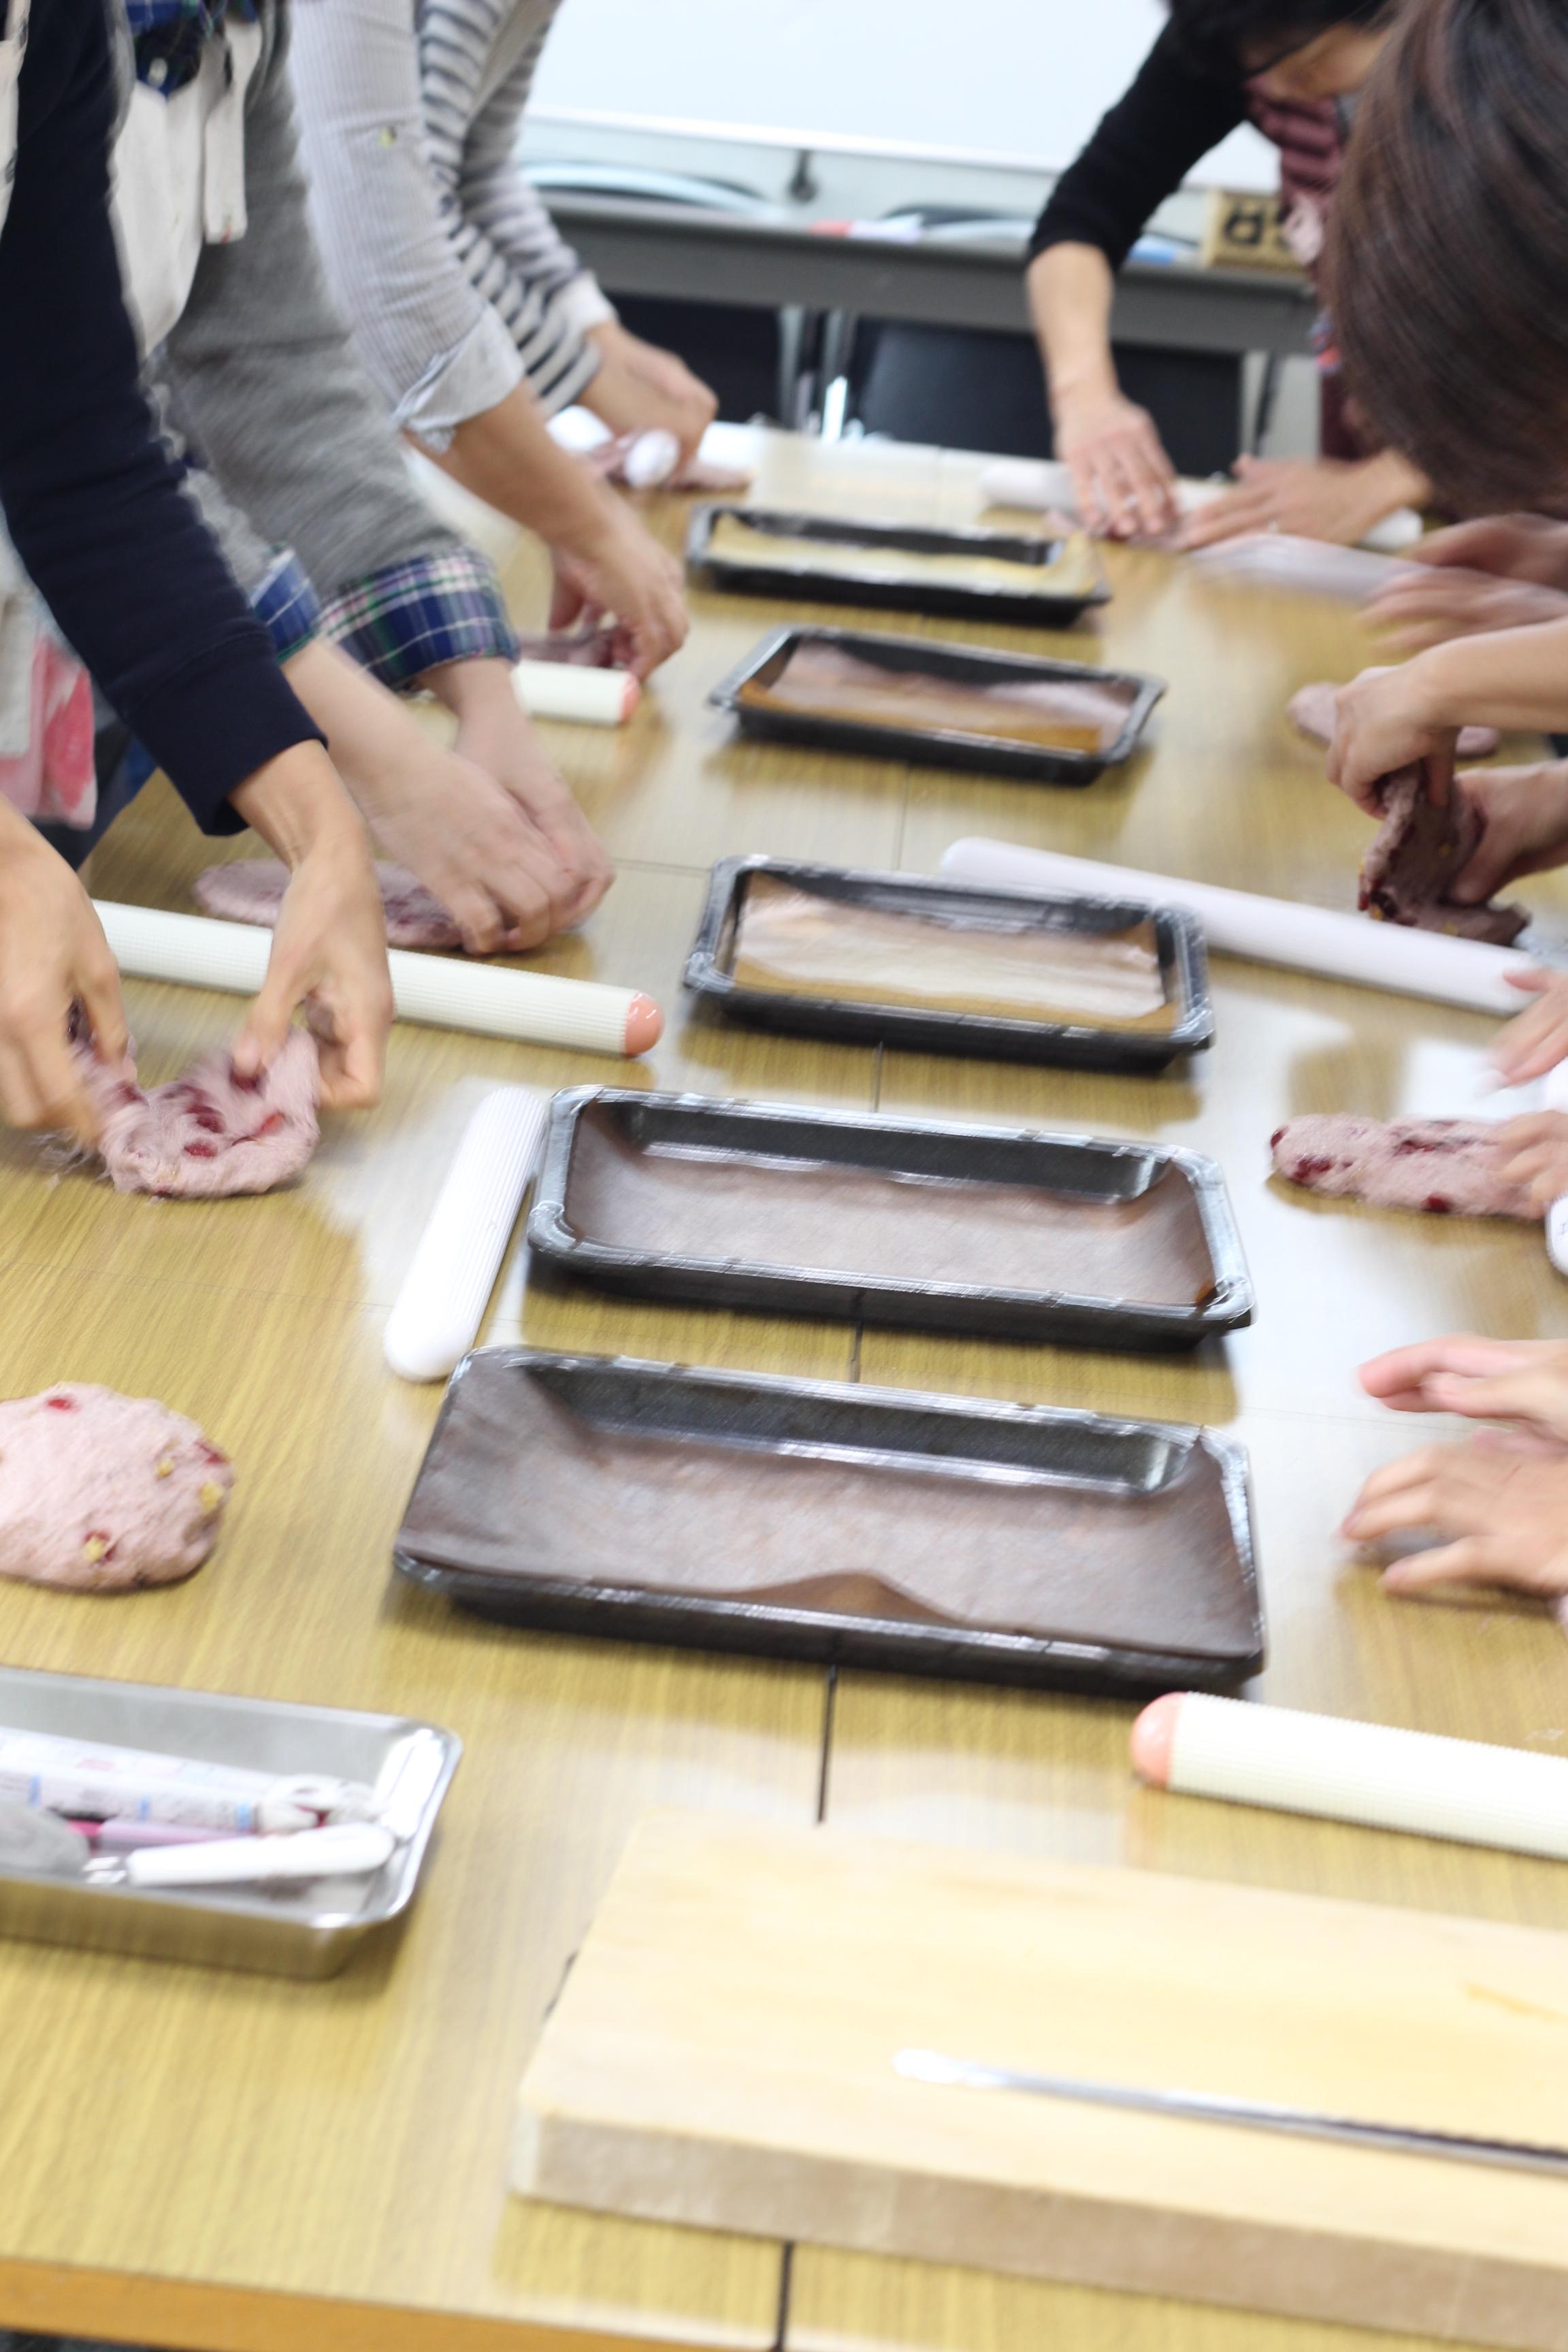 a-ta-sante糖質制限パン料理教室、阿倍野区西田辺。会館でのレッスン『ヌーヴォーブレッド』